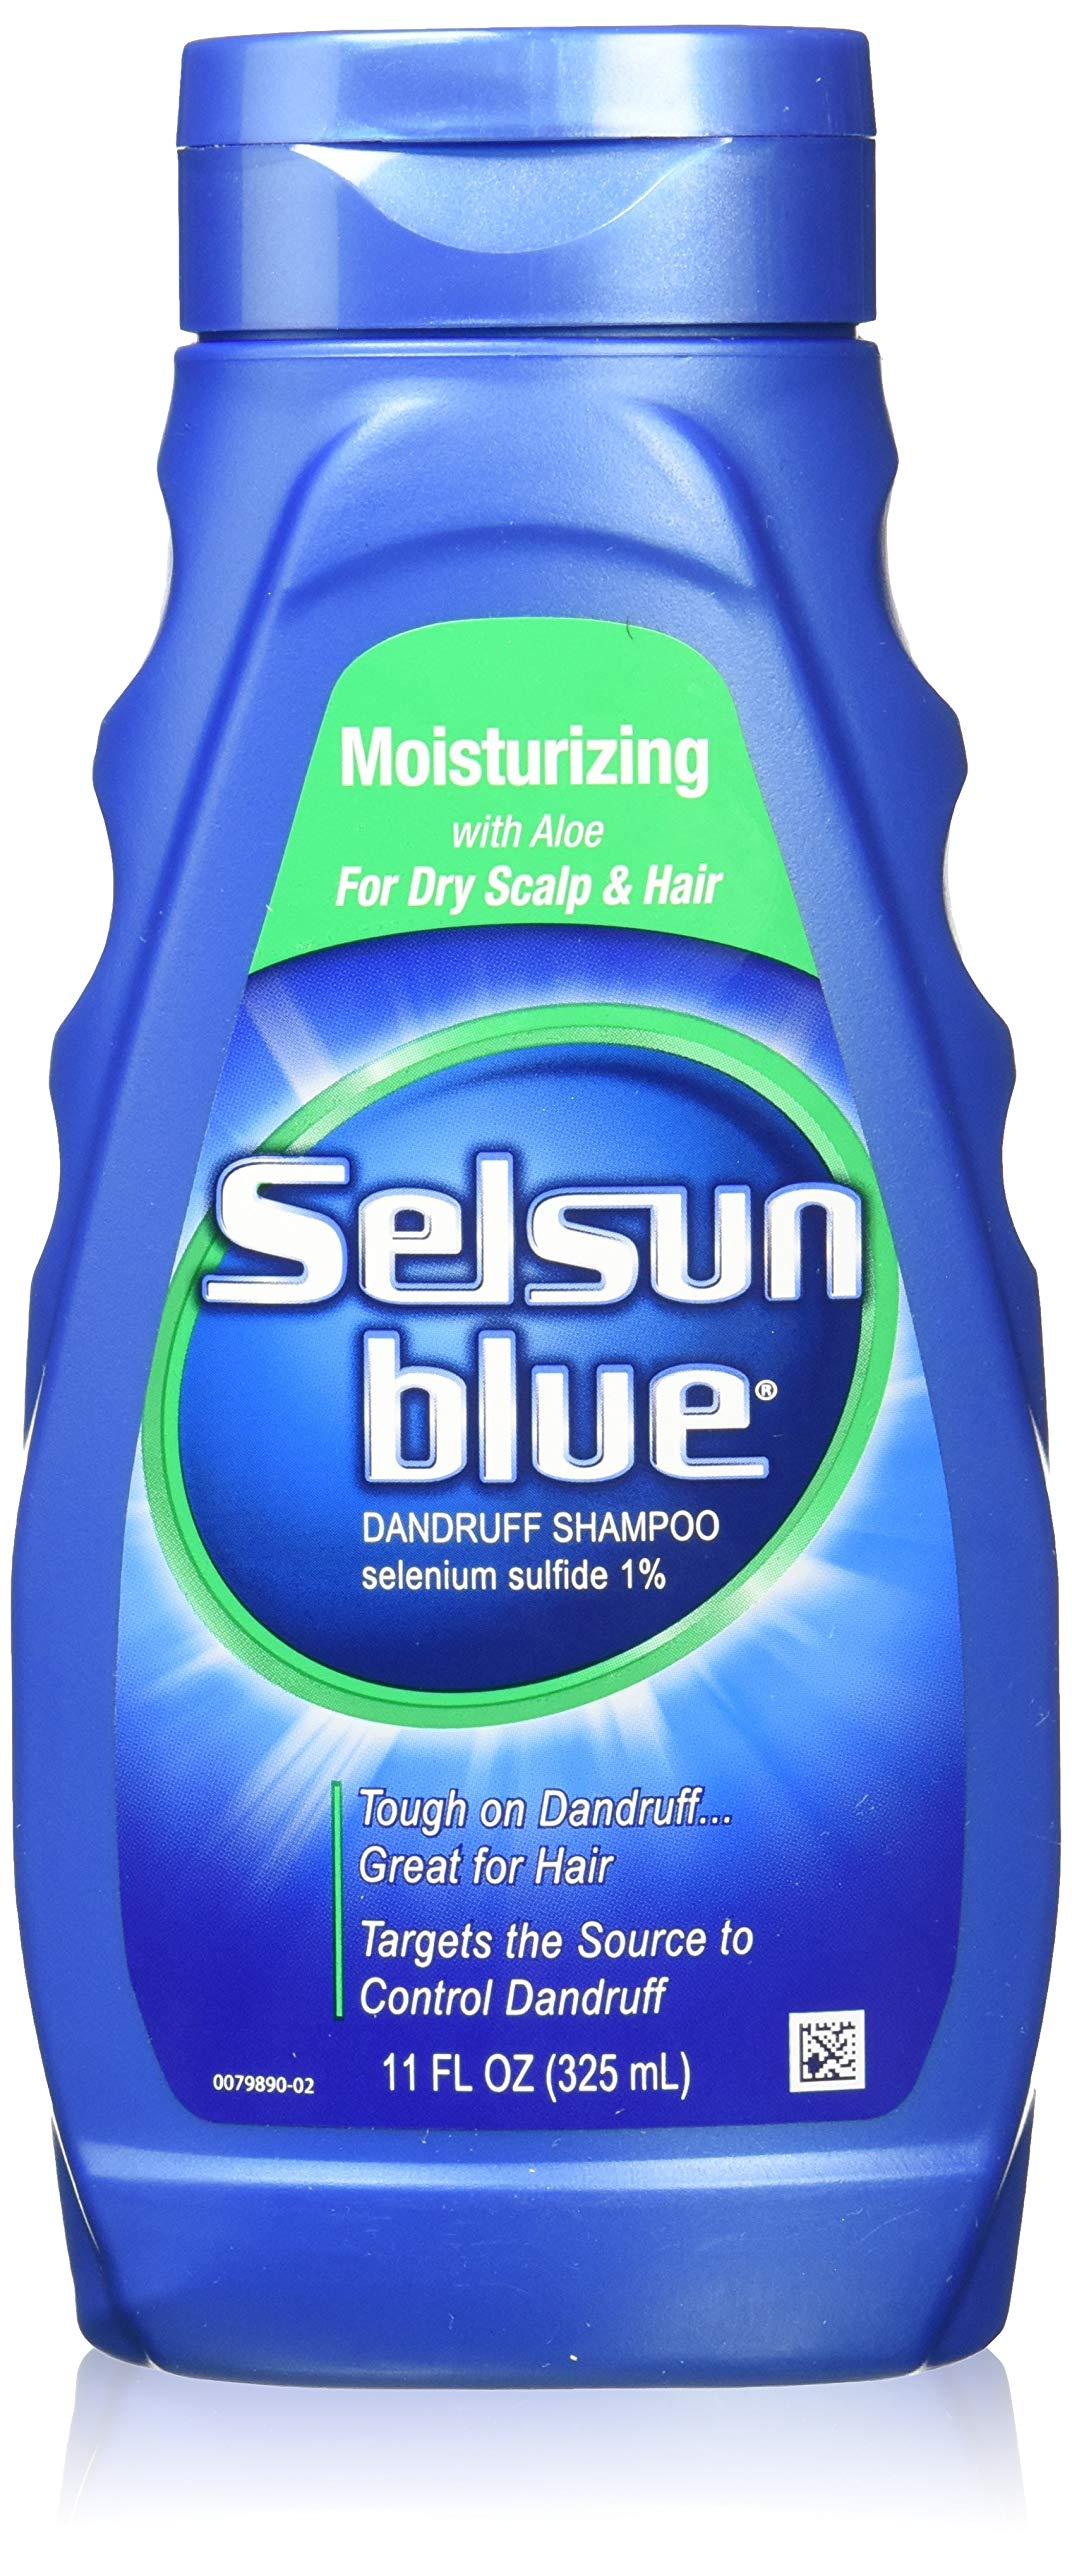 Selsun Blue Moisturizing with Aloe Dandruff Shampoo 11 oz (Pack of 2) by Selsun Blue